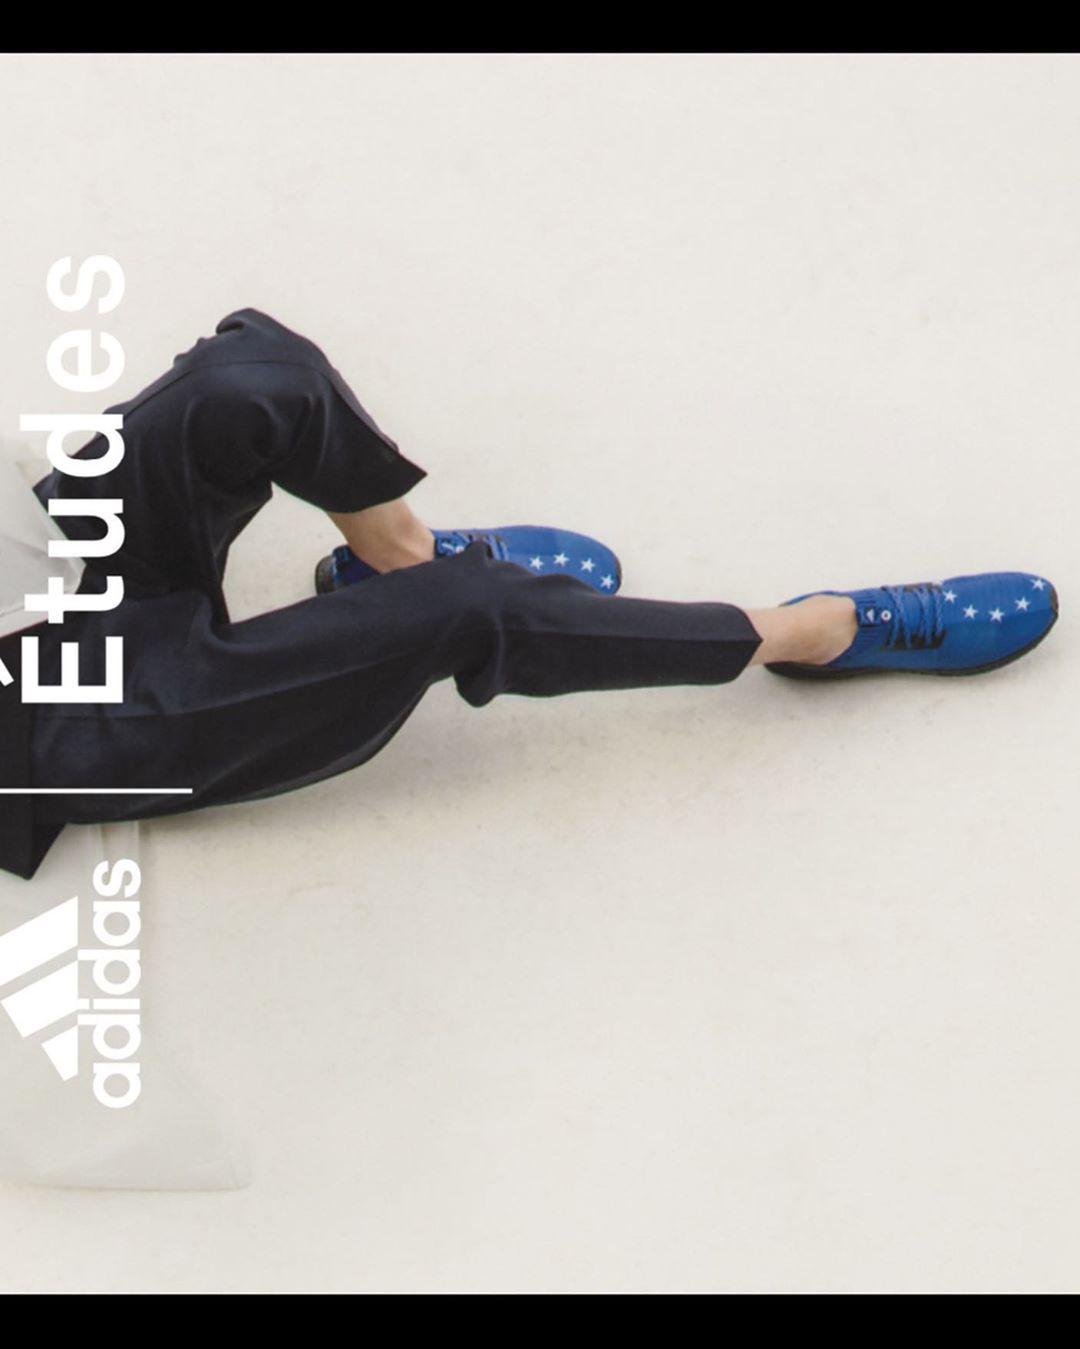 Adidas Ultra Boost & Études w/ @danielpshea @etudes #2018